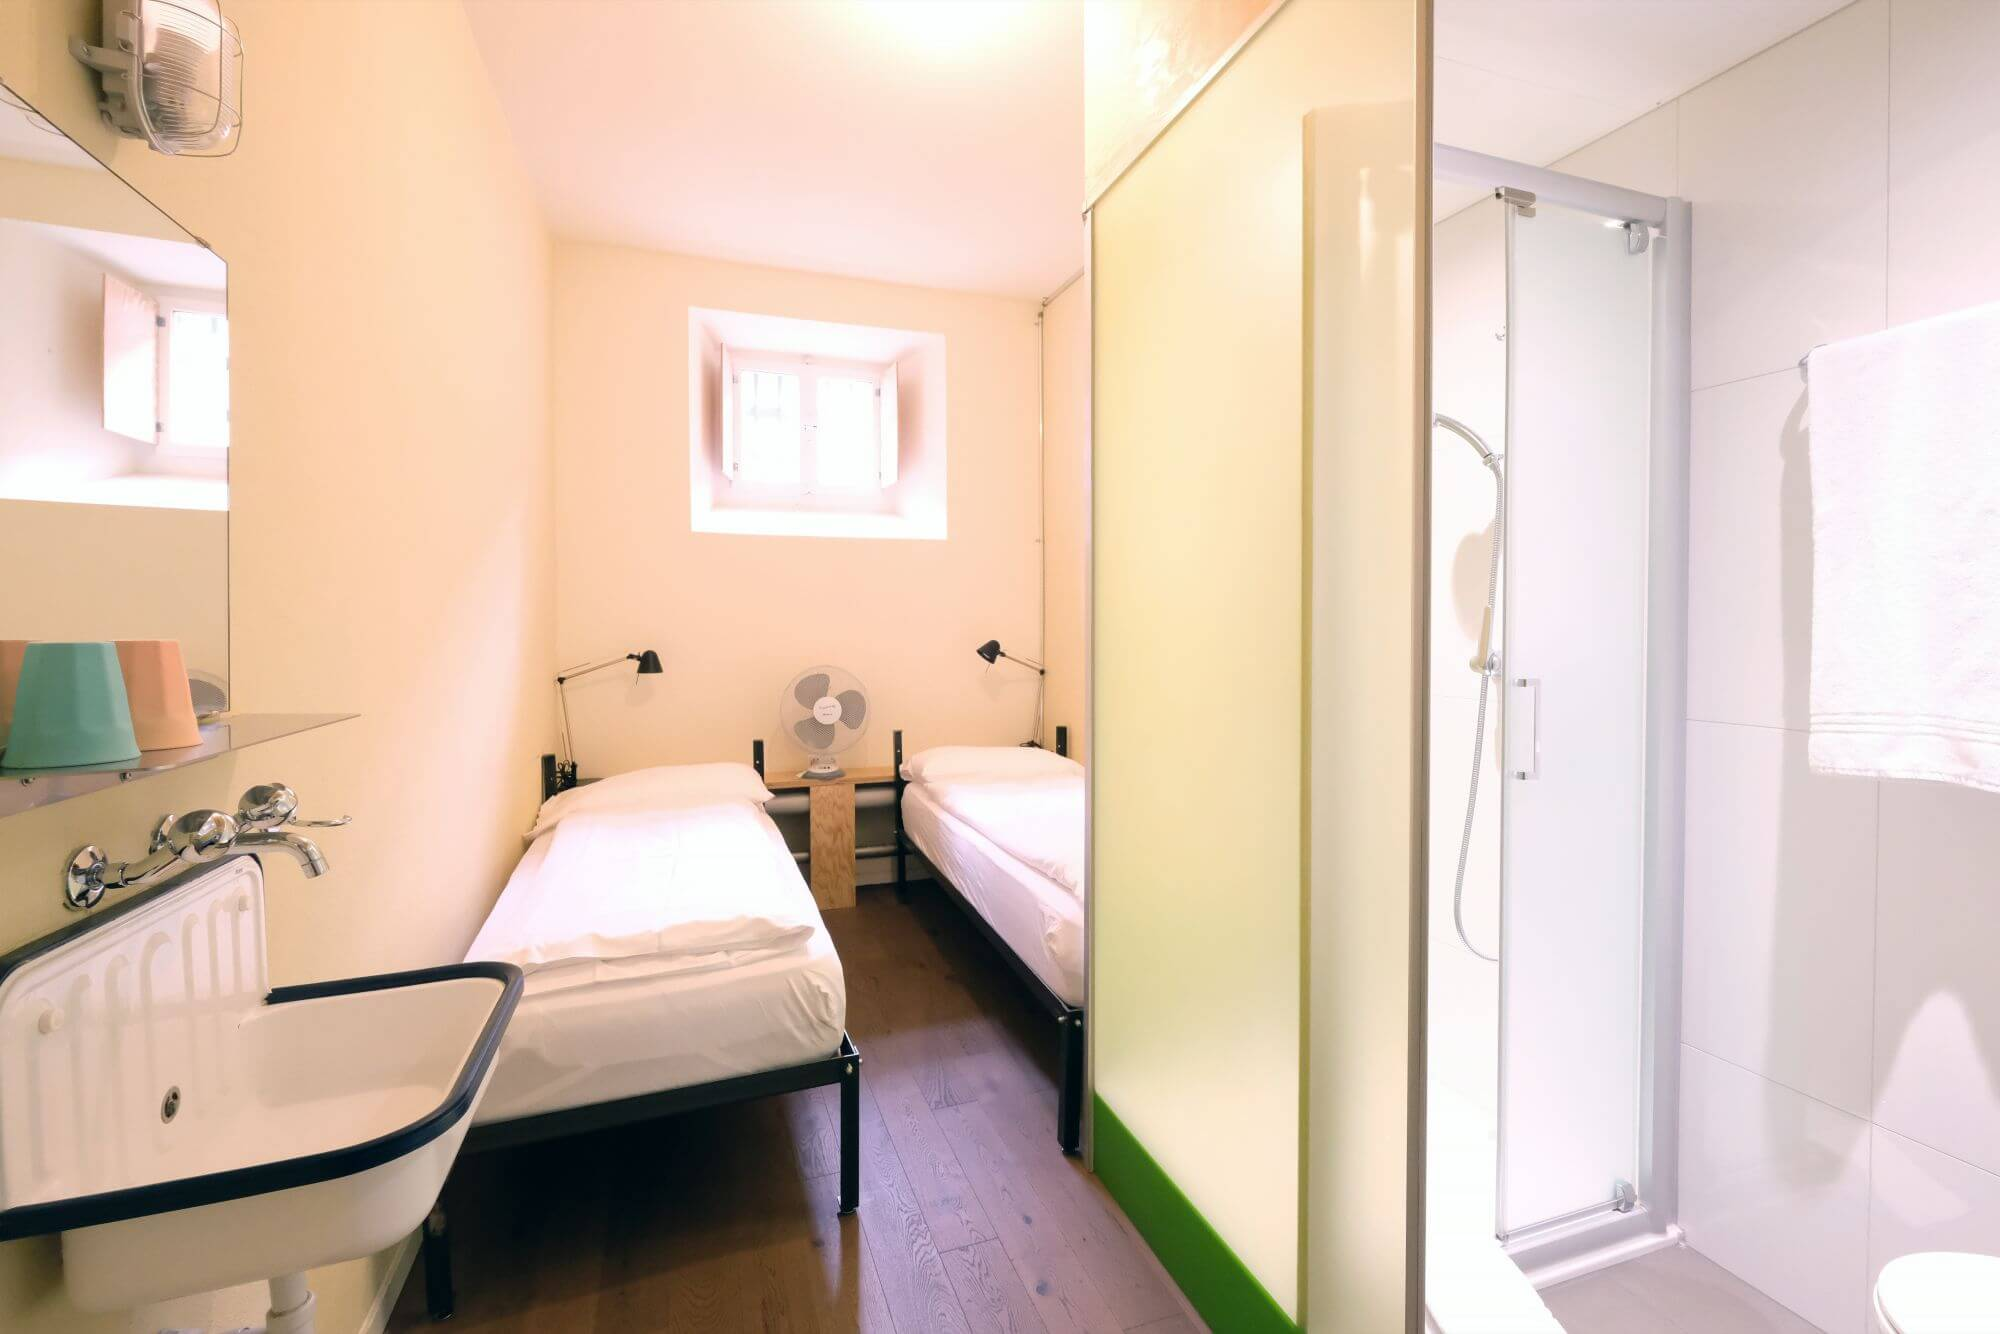 3-tage-im-barabas-hotel-in-luzern